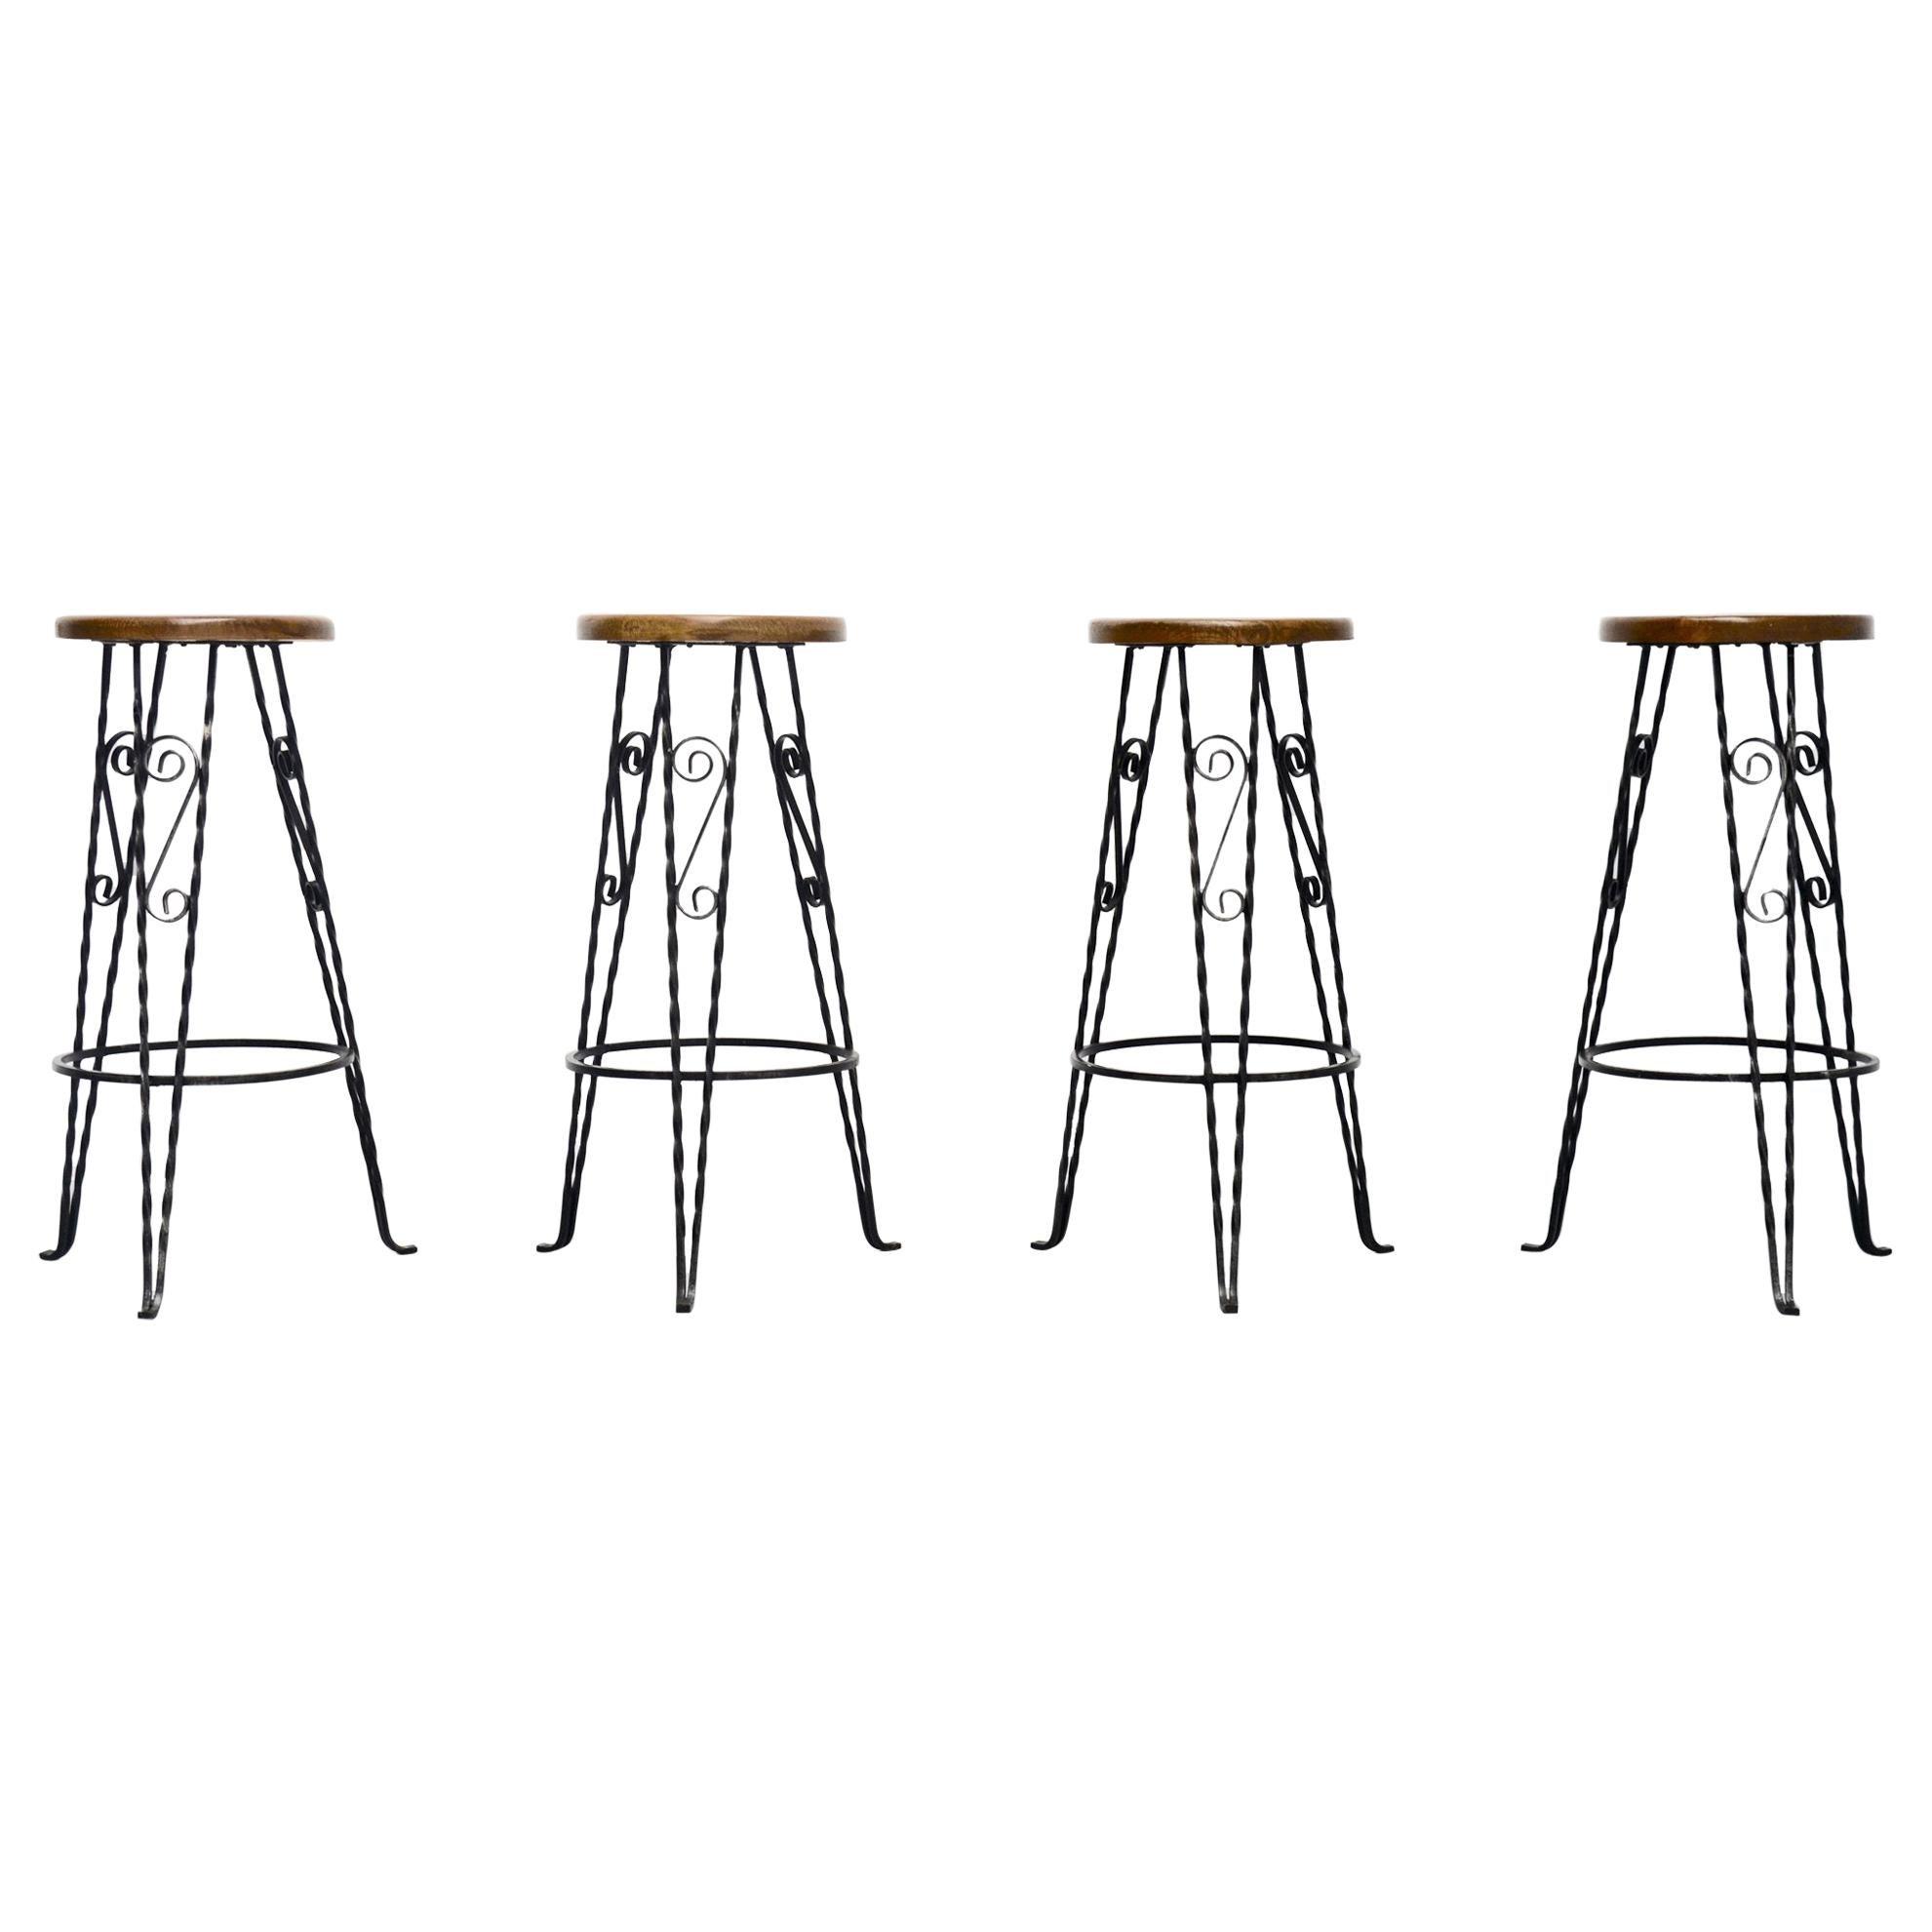 Wrought iron bar stools France 1960